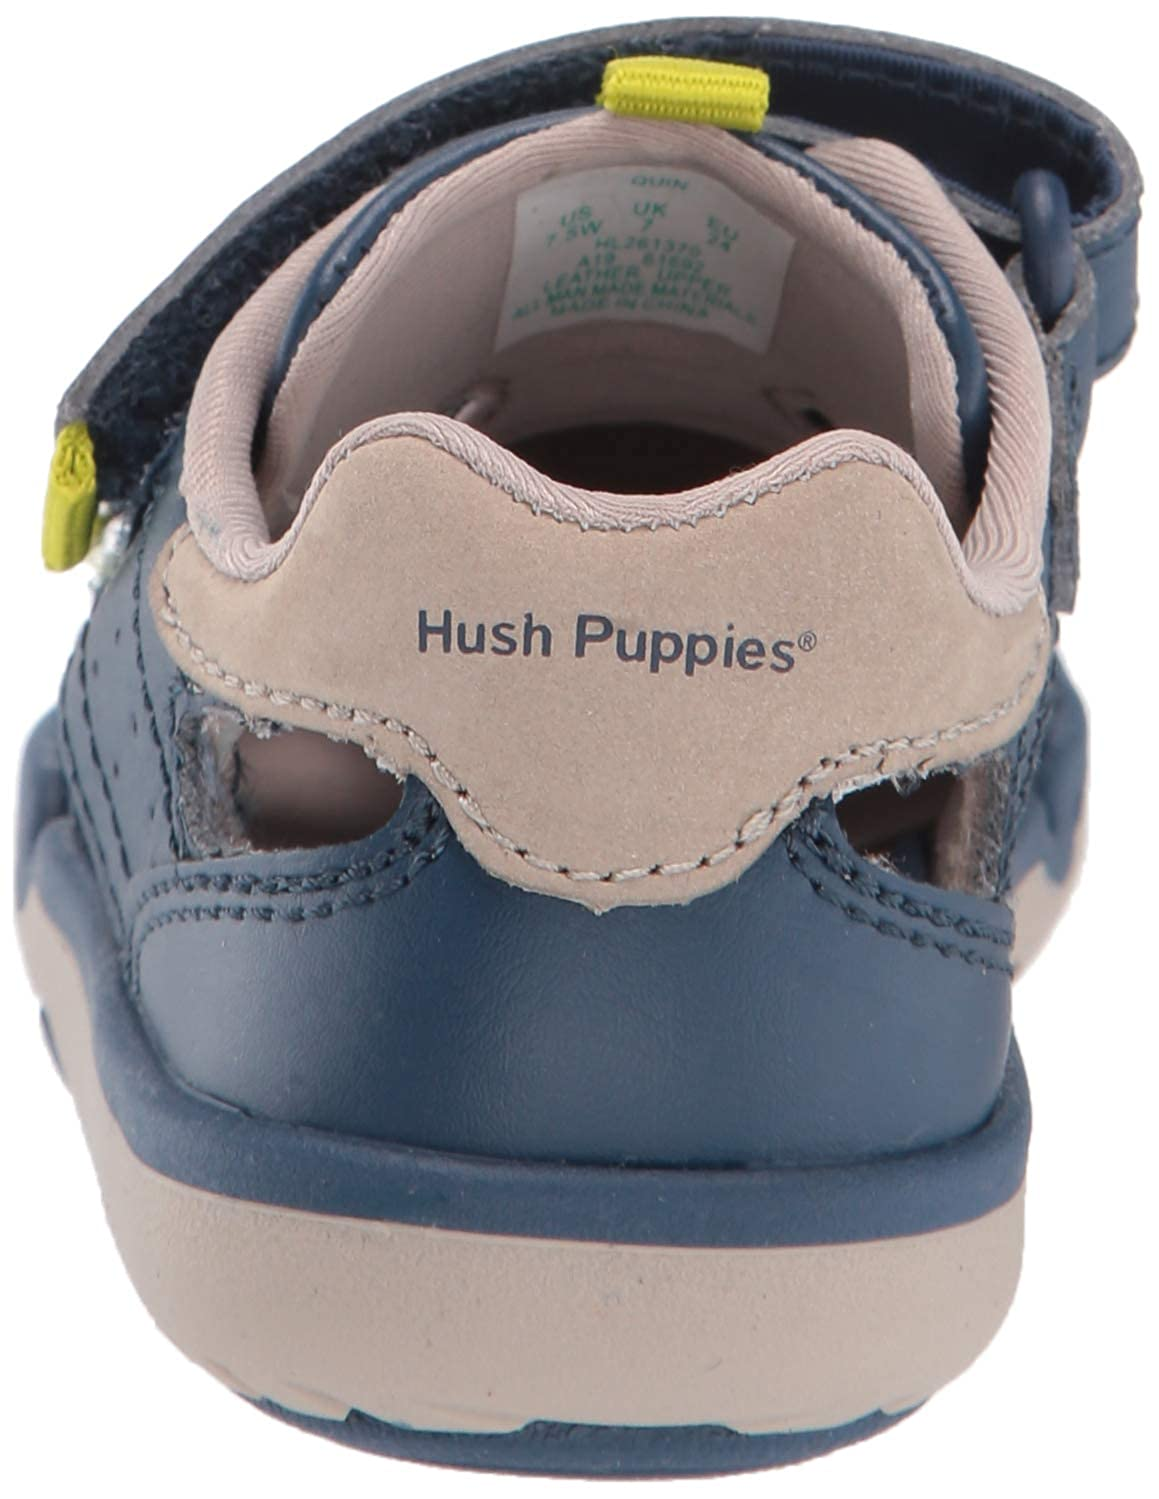 Hush Puppies Kids Quin Sandal